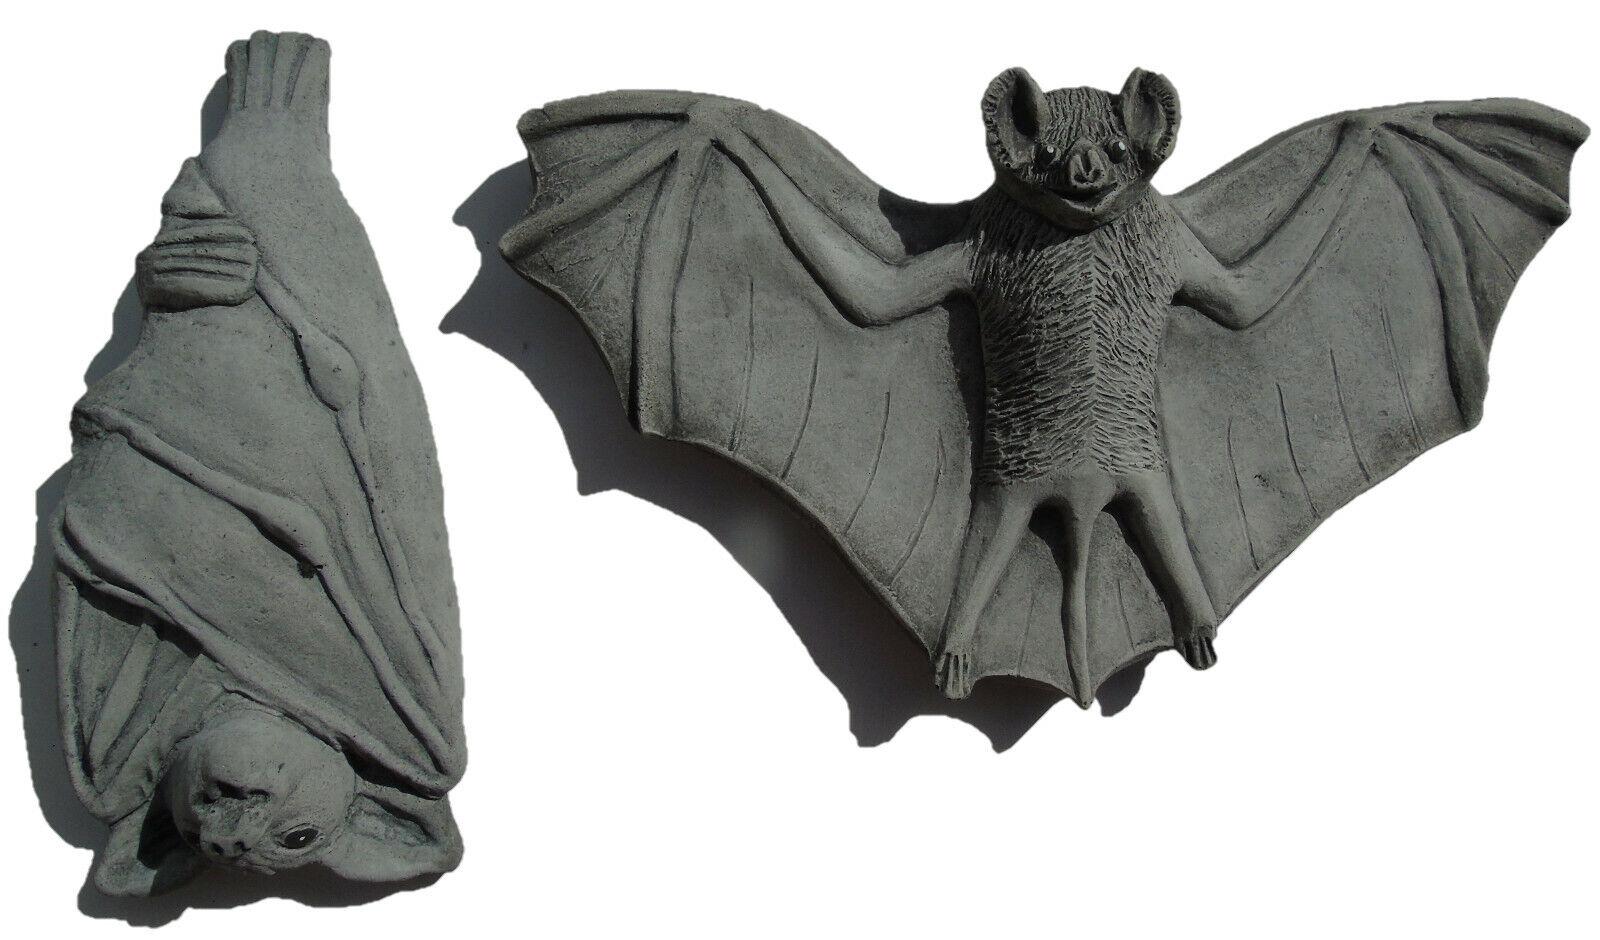 2 pc Bat Wall Plaques Stone Hanging Garden Ornaments Hand Cast